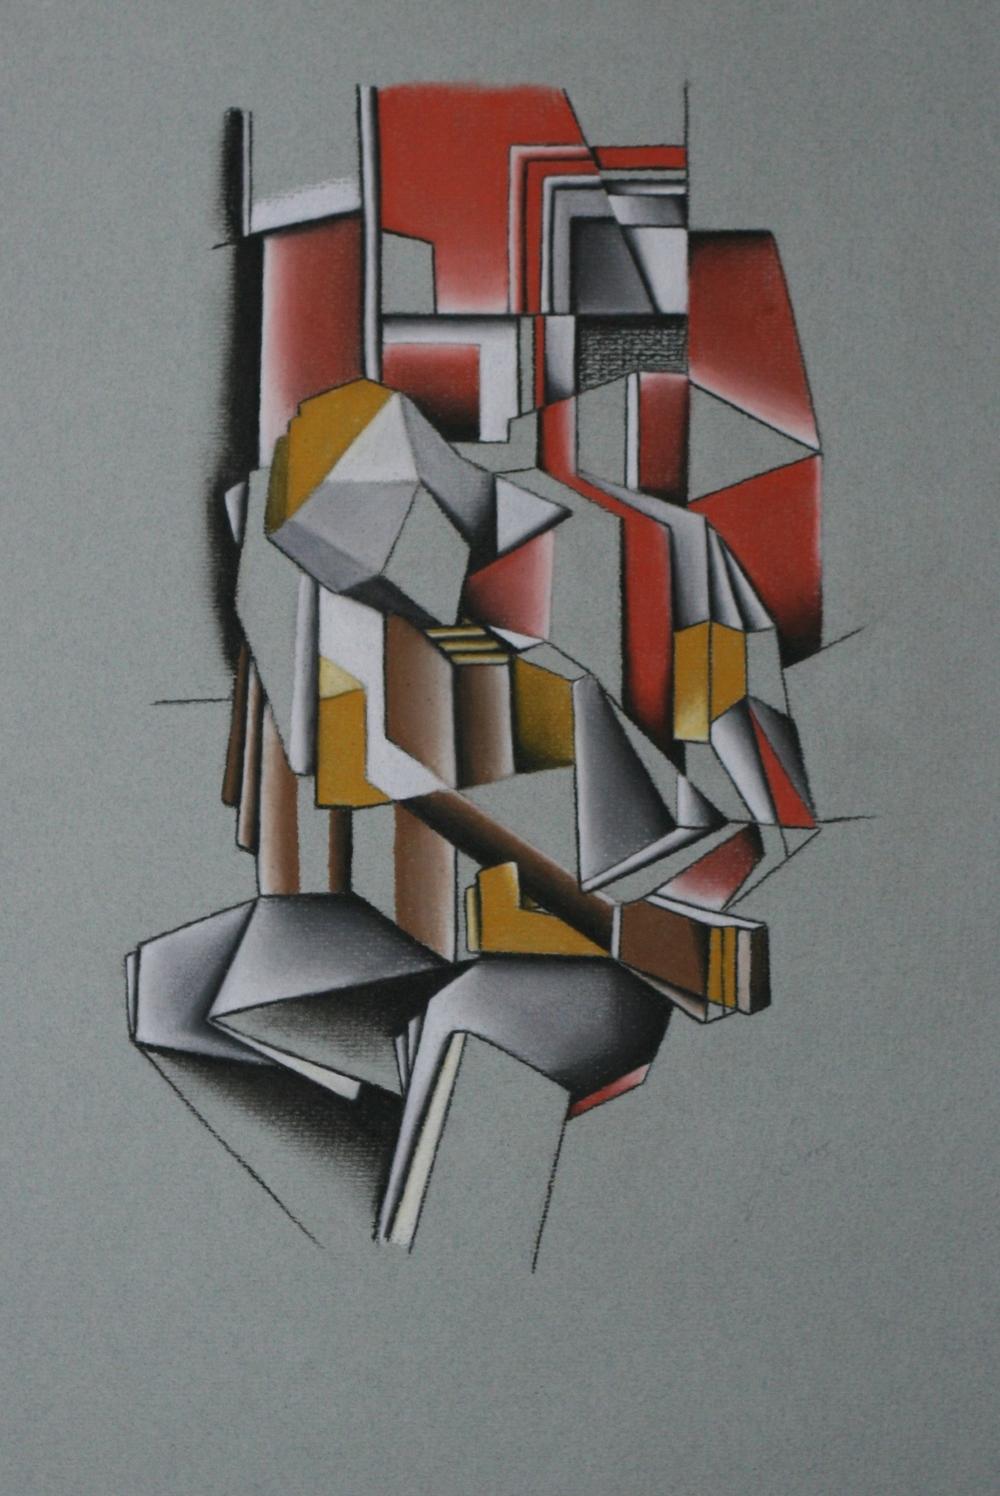 Guitarist - Pastel Pencil on paper (30x40cm)